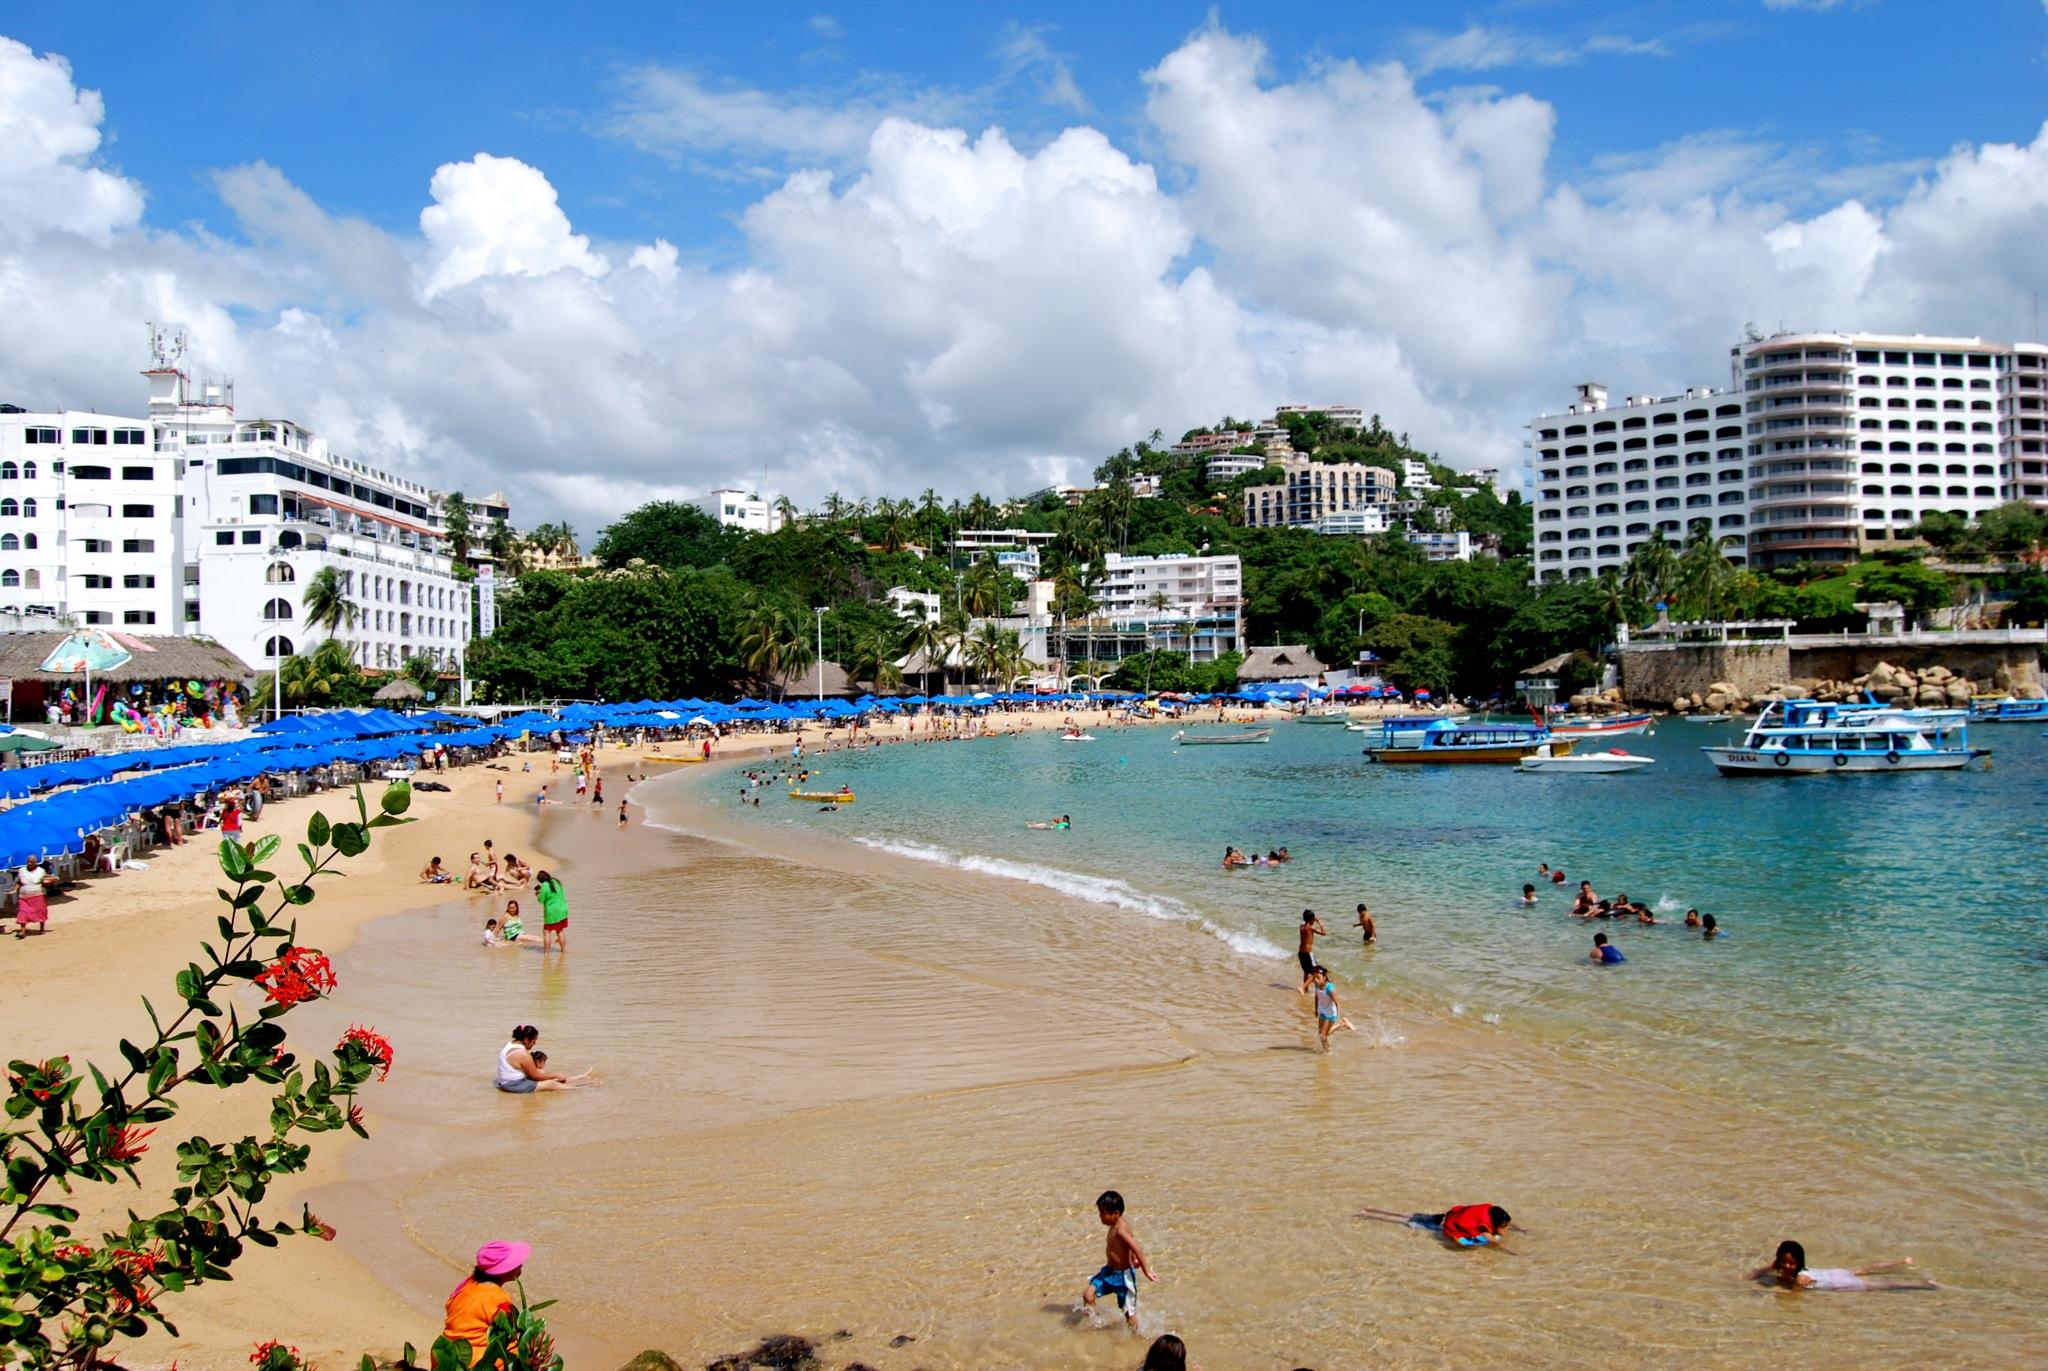 Arribarán 1.5 millones de visitantes a centros turísticos en Semana Santa